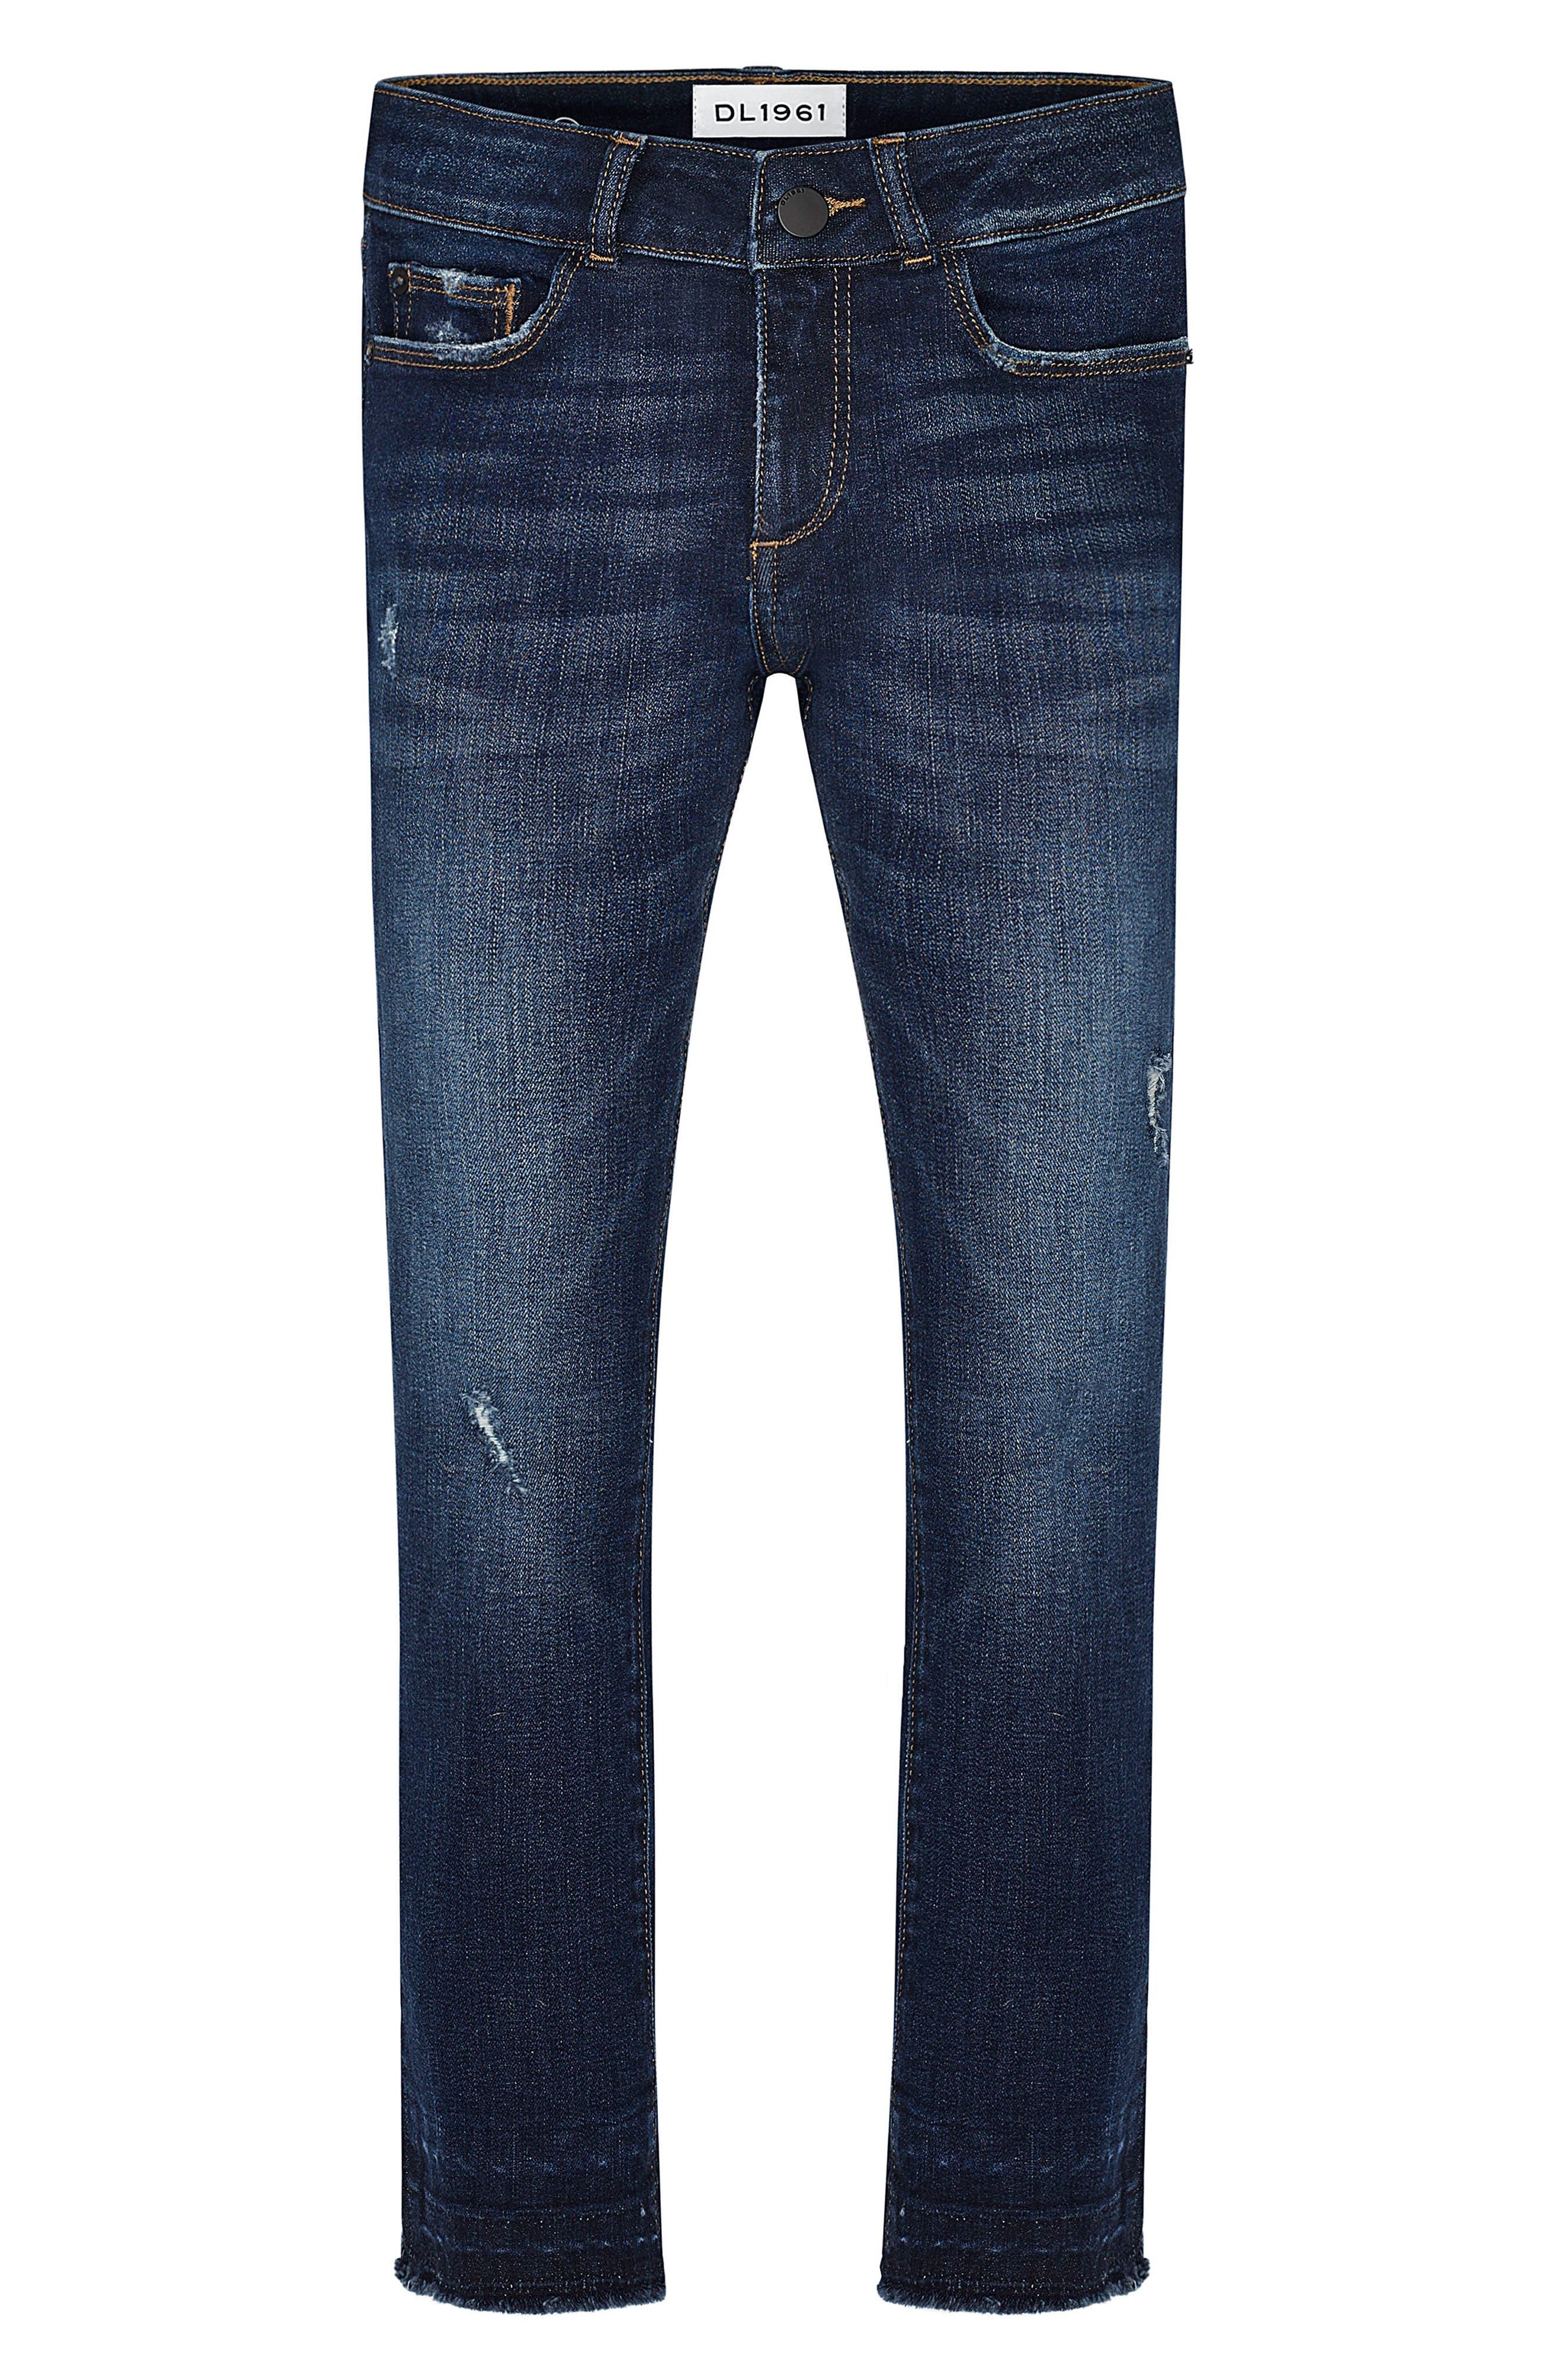 DL1961 Chloe Distressed Skinny Jeans (Big Girls)